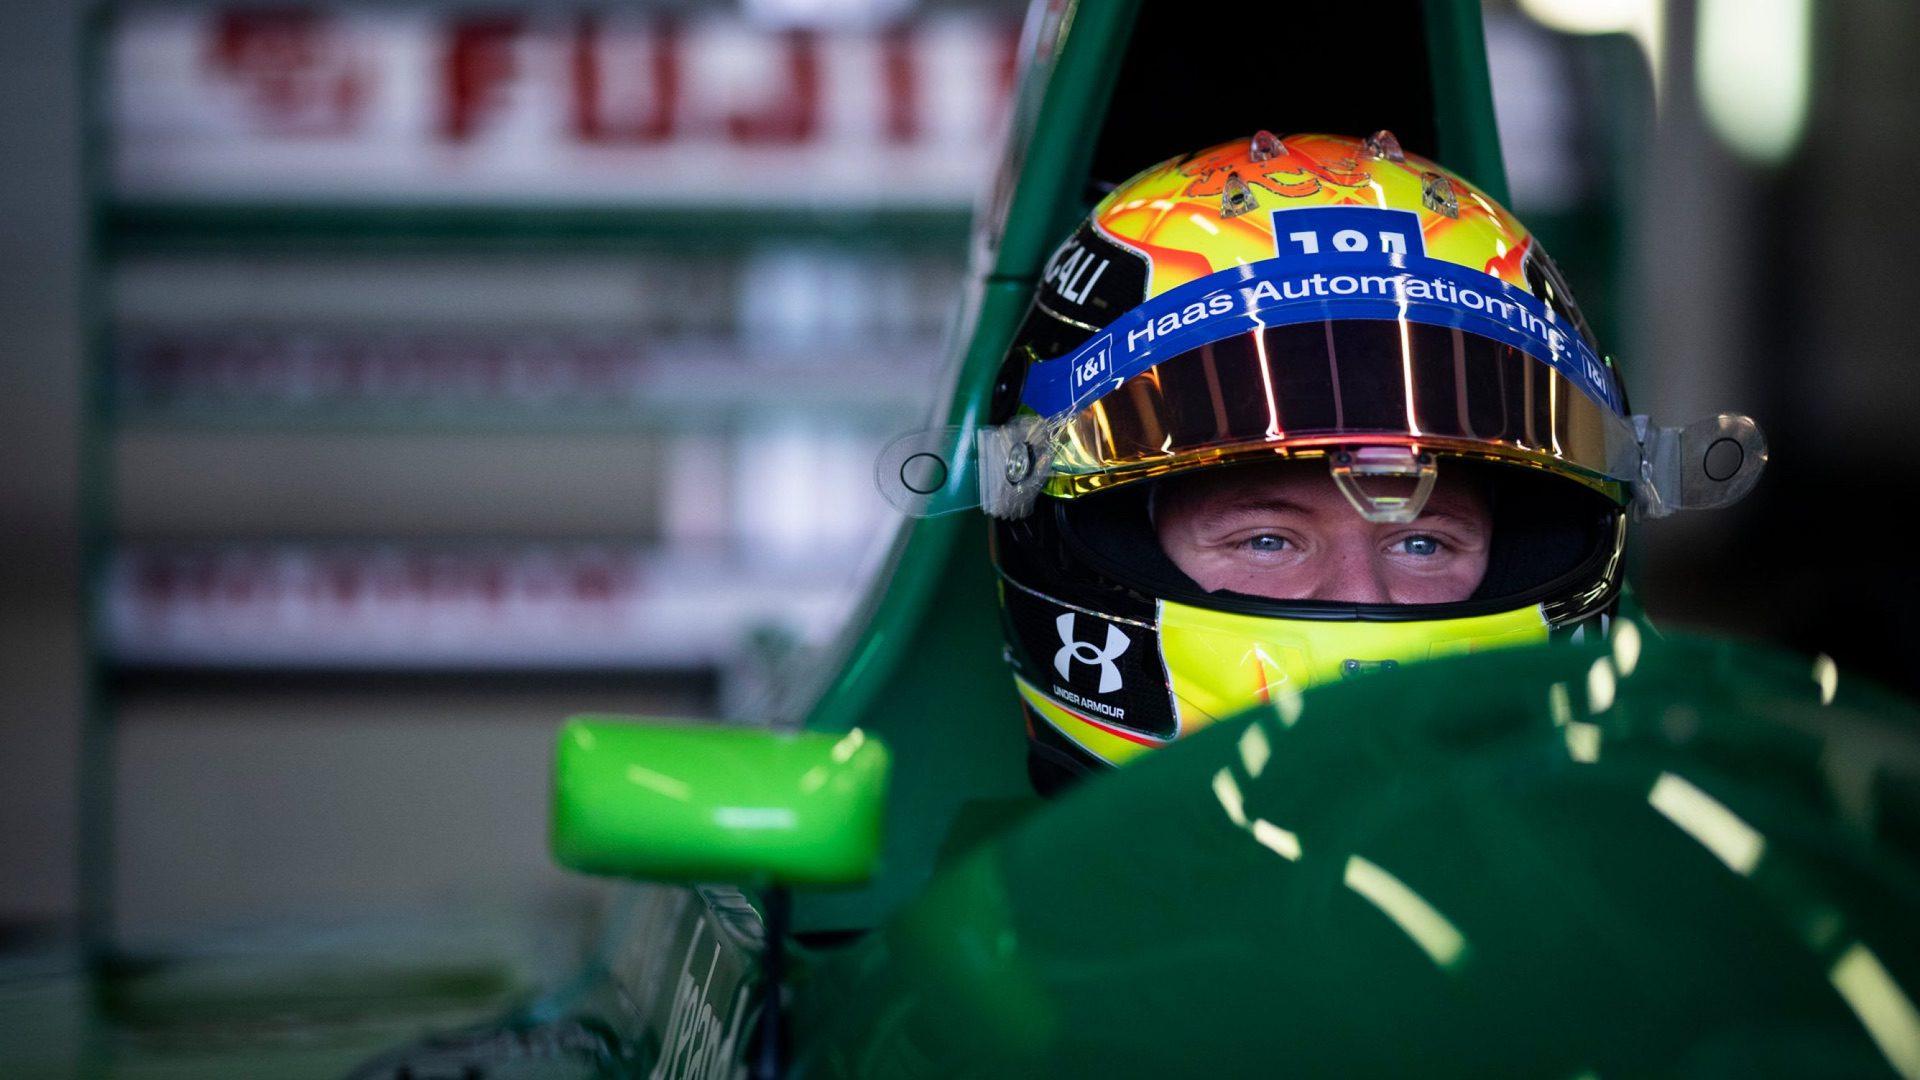 Mick_Schumacher_Jordan_191_Silverstone-0004